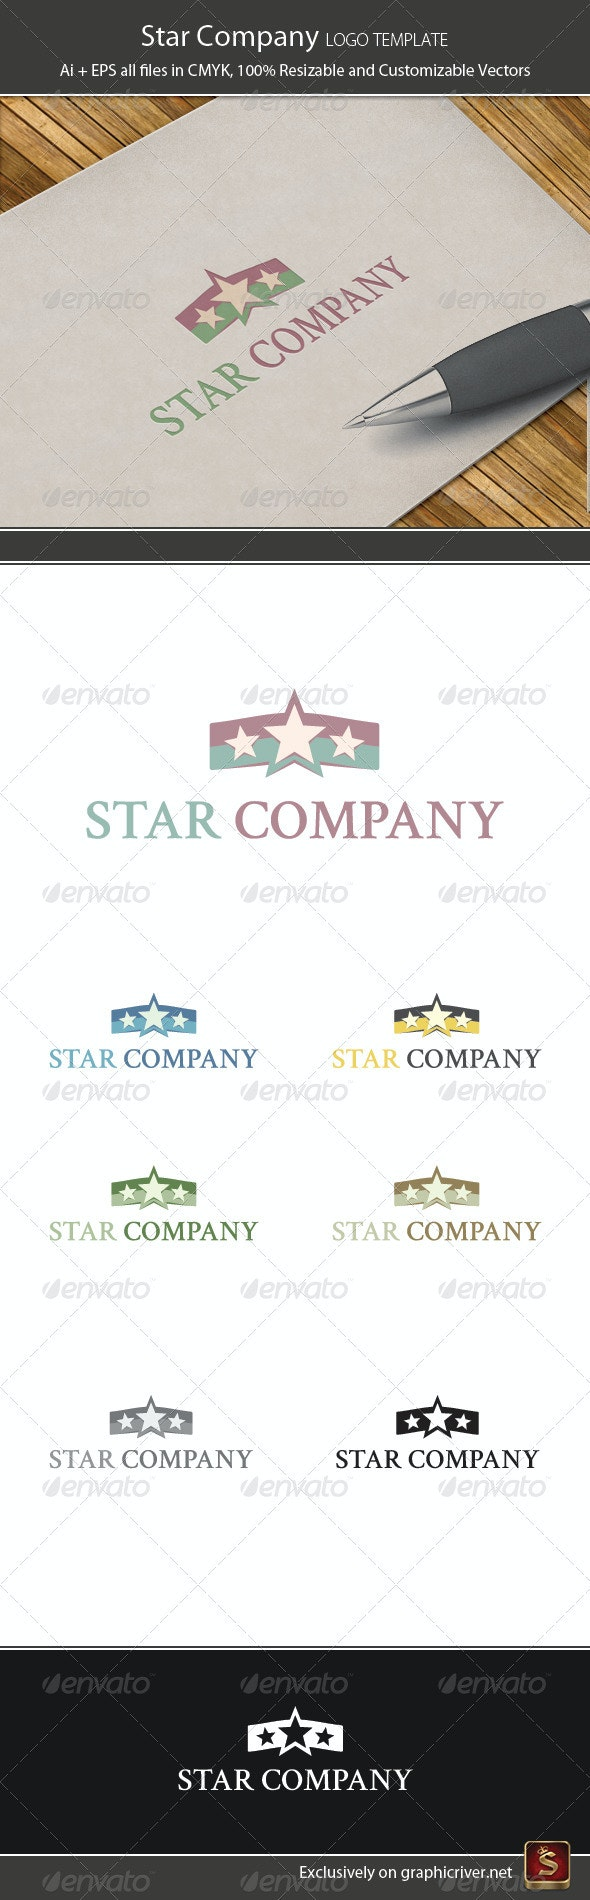 Star Company Logo Template - Vector Abstract